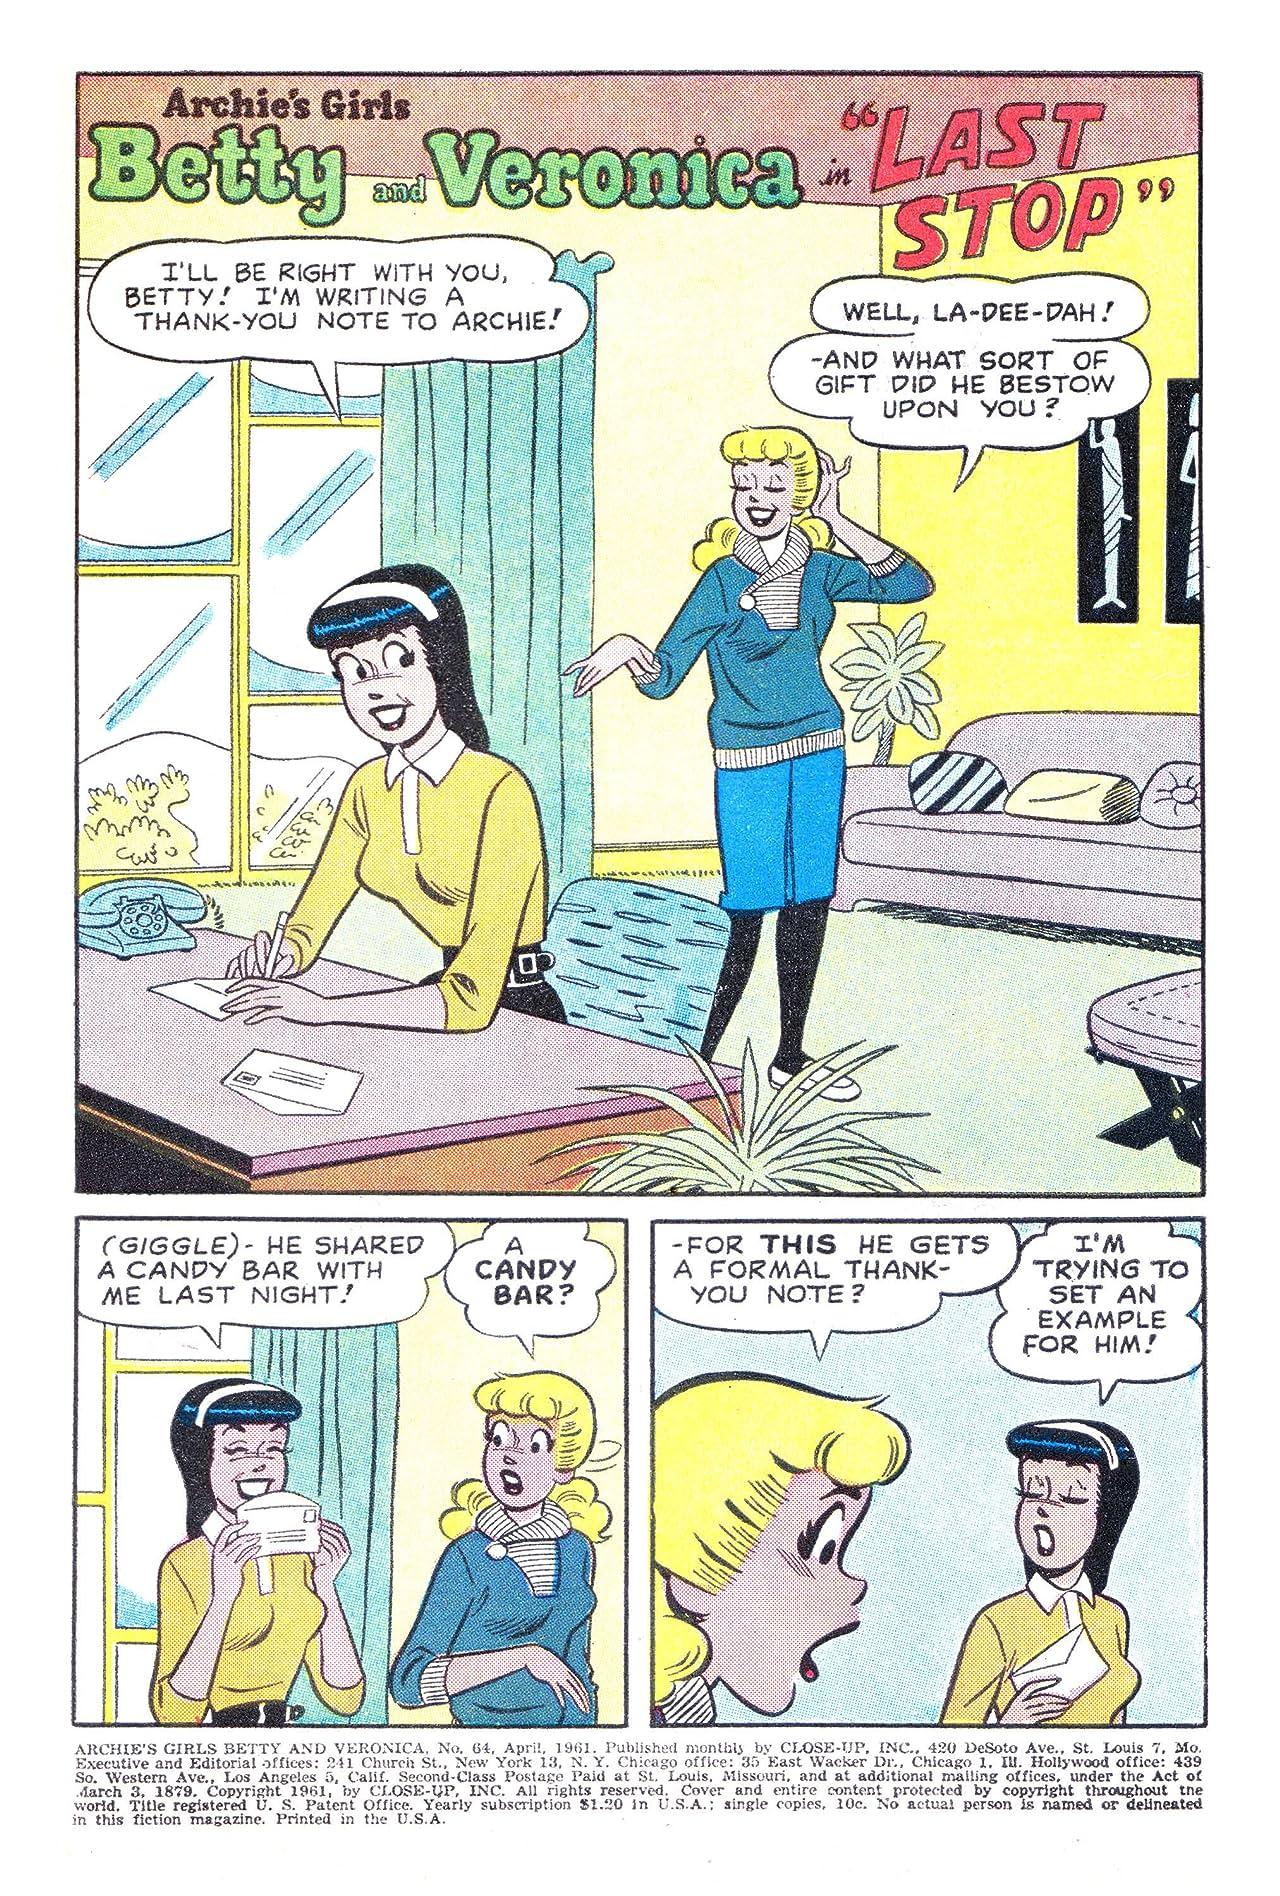 Archie's Girls Betty & Veronica #64